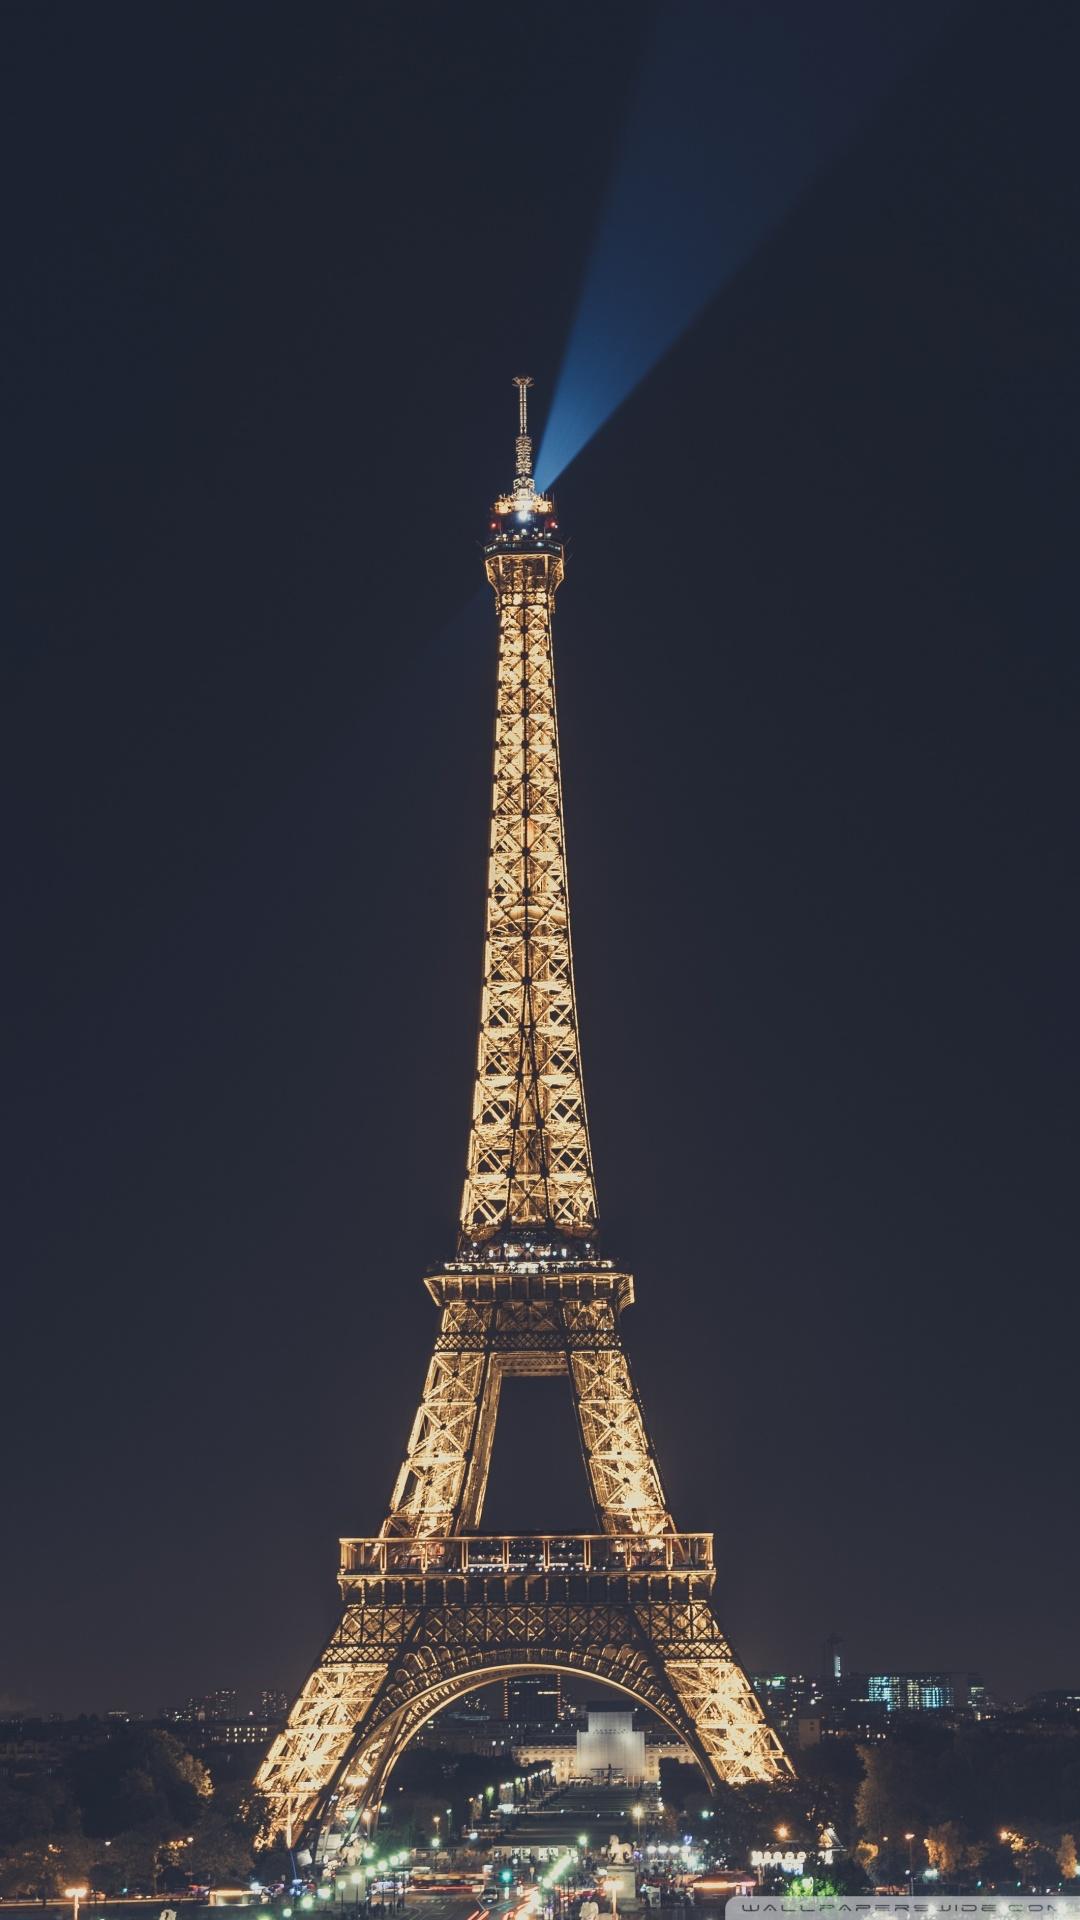 Wallpaper images eiffel tower at night paris france wallpaper 1080x1920 supportive guru - Paris tower live wallpaper ...